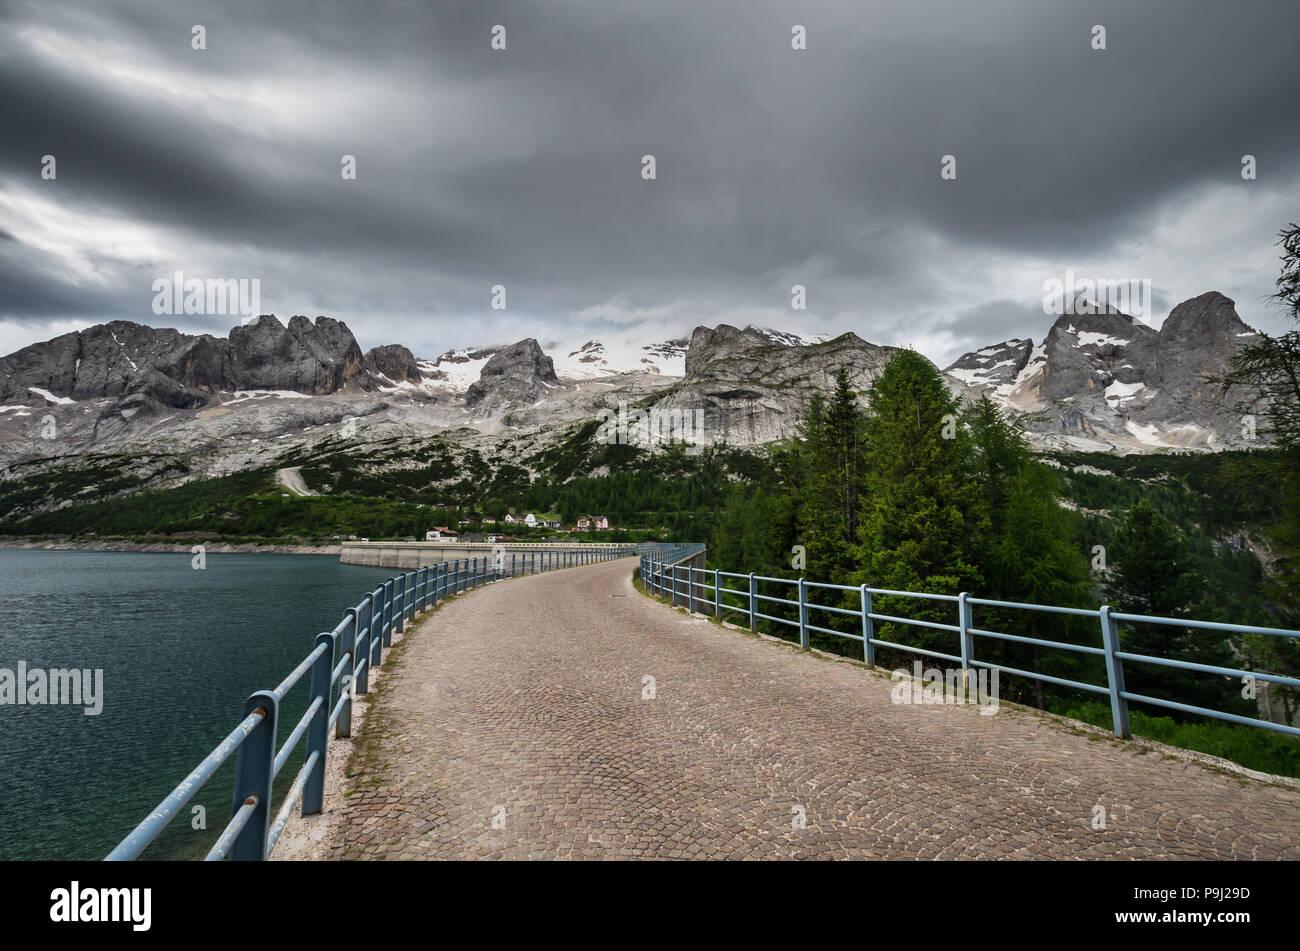 Lago Fedaia - Fedaia Lake, Dolomiti mountain Italy. Marmolada massif in Trentino Alto Adige, South Tyrol italian Dolomites - Stock Image